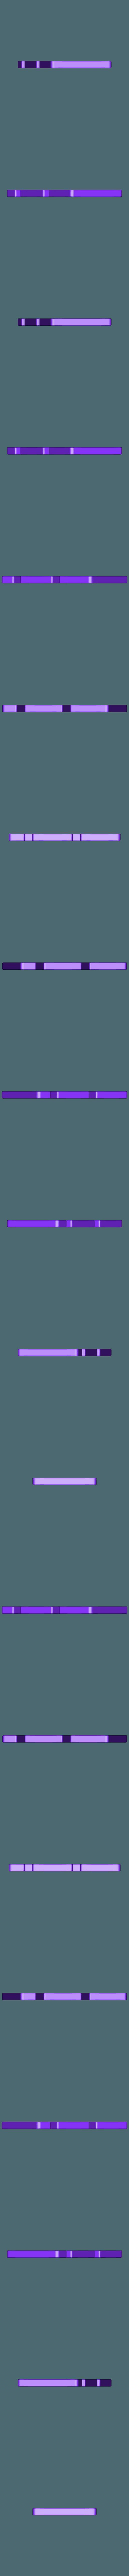 part3x2.stl Download free STL file The lattice puzzle • 3D printing object, dancingchicken